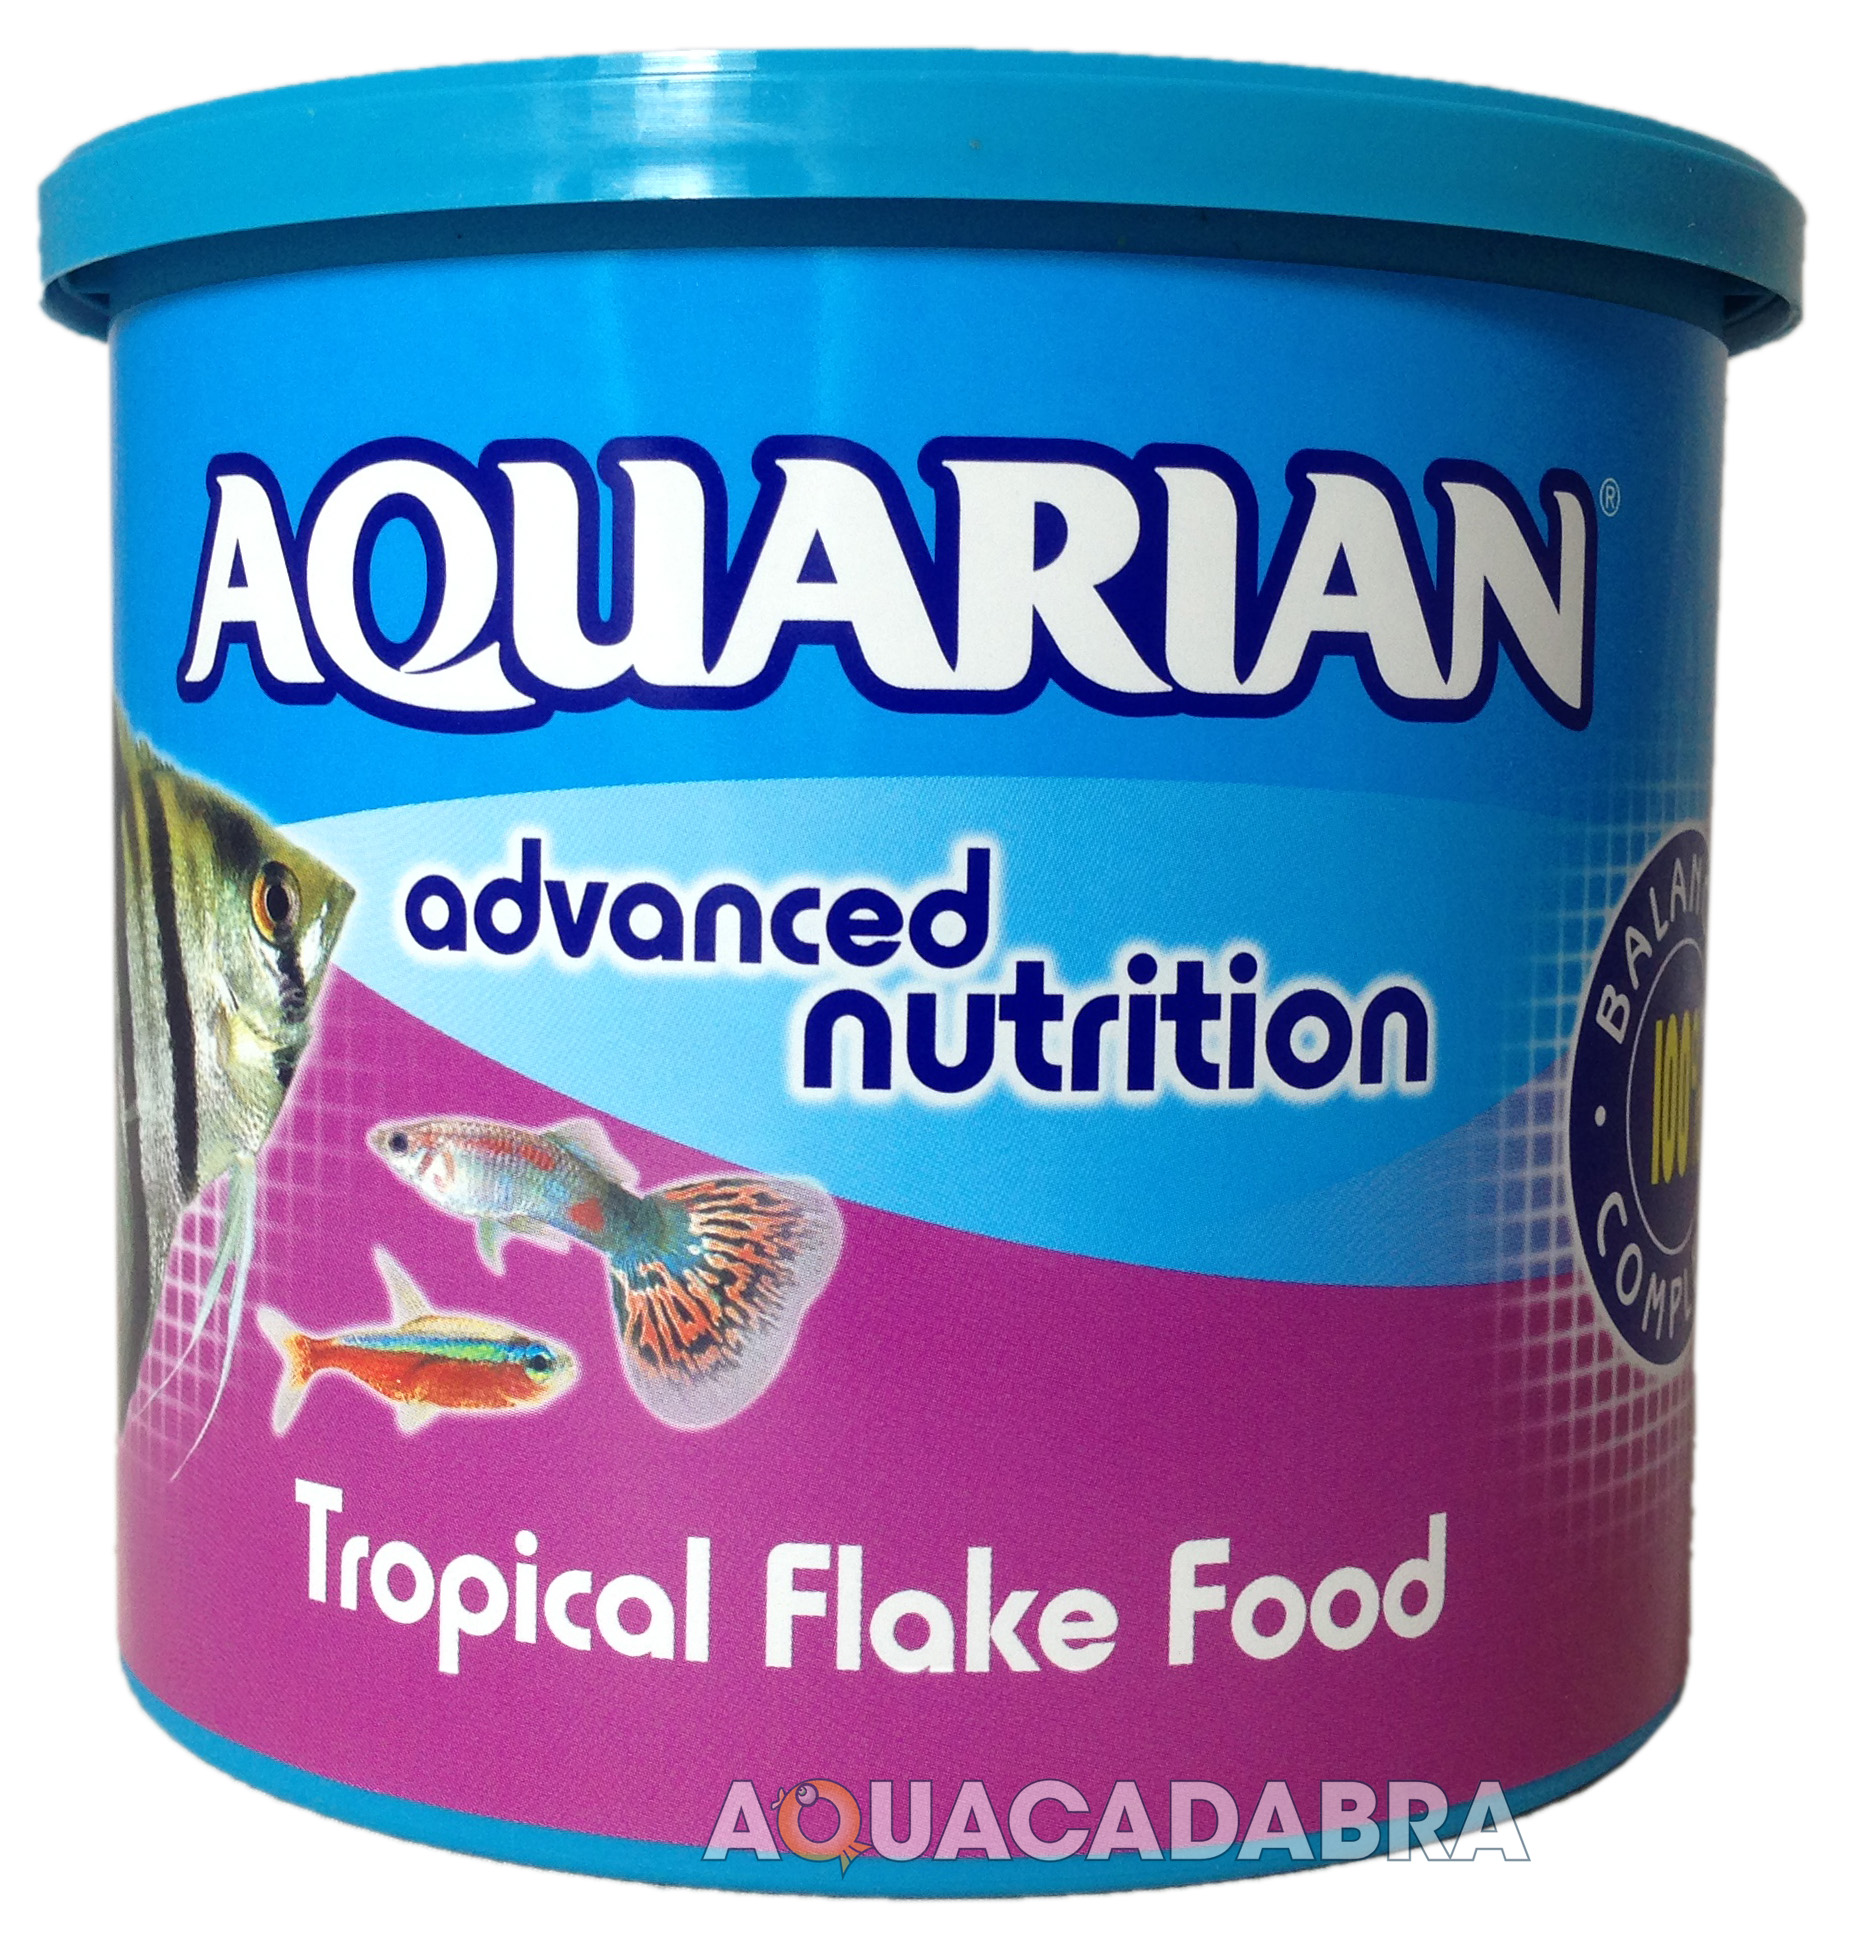 GENUINE AQUARIAN TROPICAL FISH FLAKE FOOD 25G,50G,200G FISH TANK AQUARIUM FLAKES | eBay